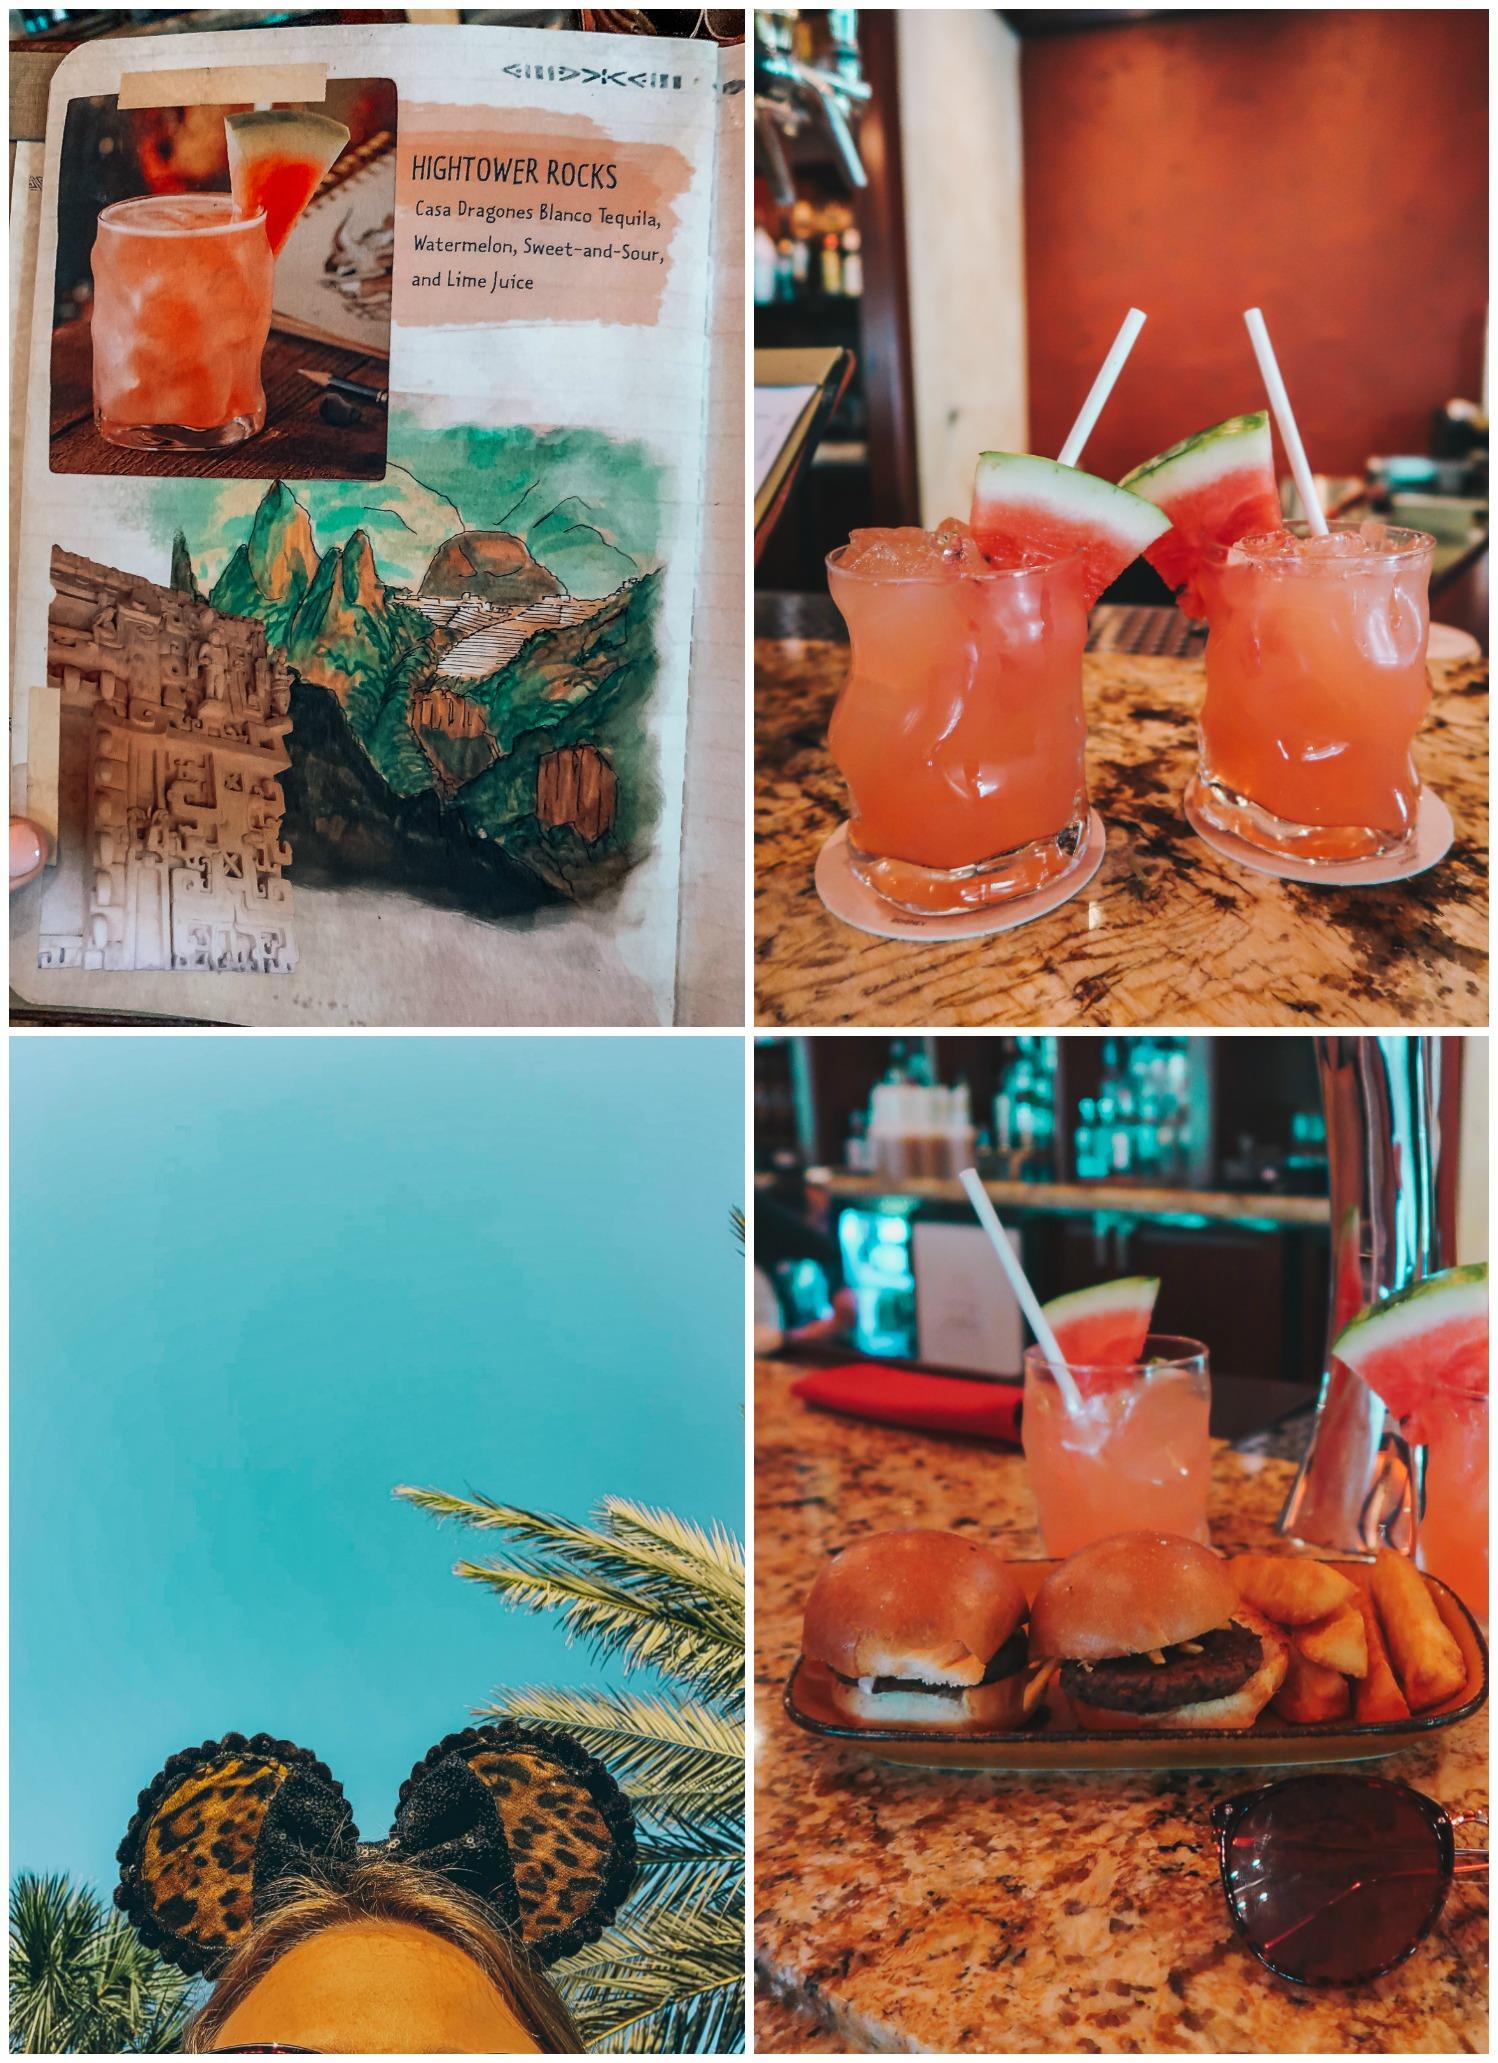 Itinerary Walt Disney World Animal Kingdom Nomad Lounge Vegan food cocktails yucca fries